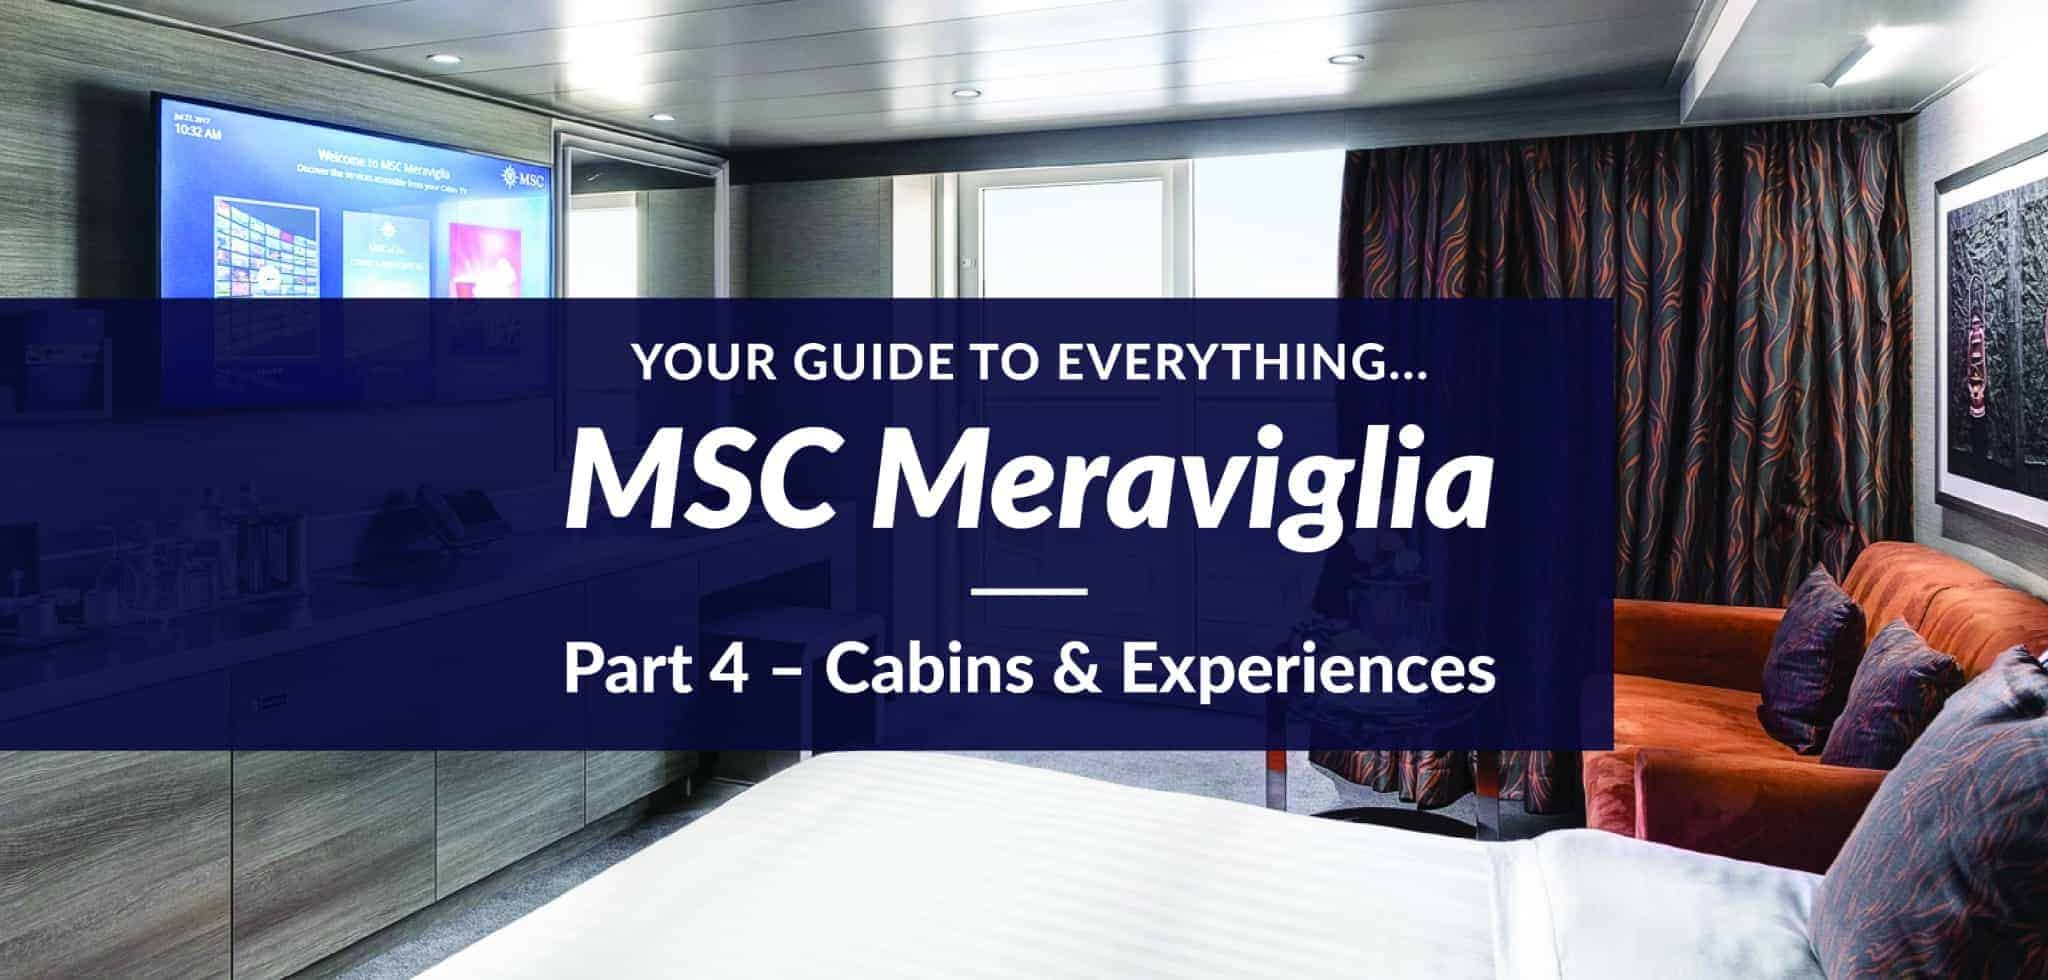 MSC Meraviglia Cabins and Experiences Guide